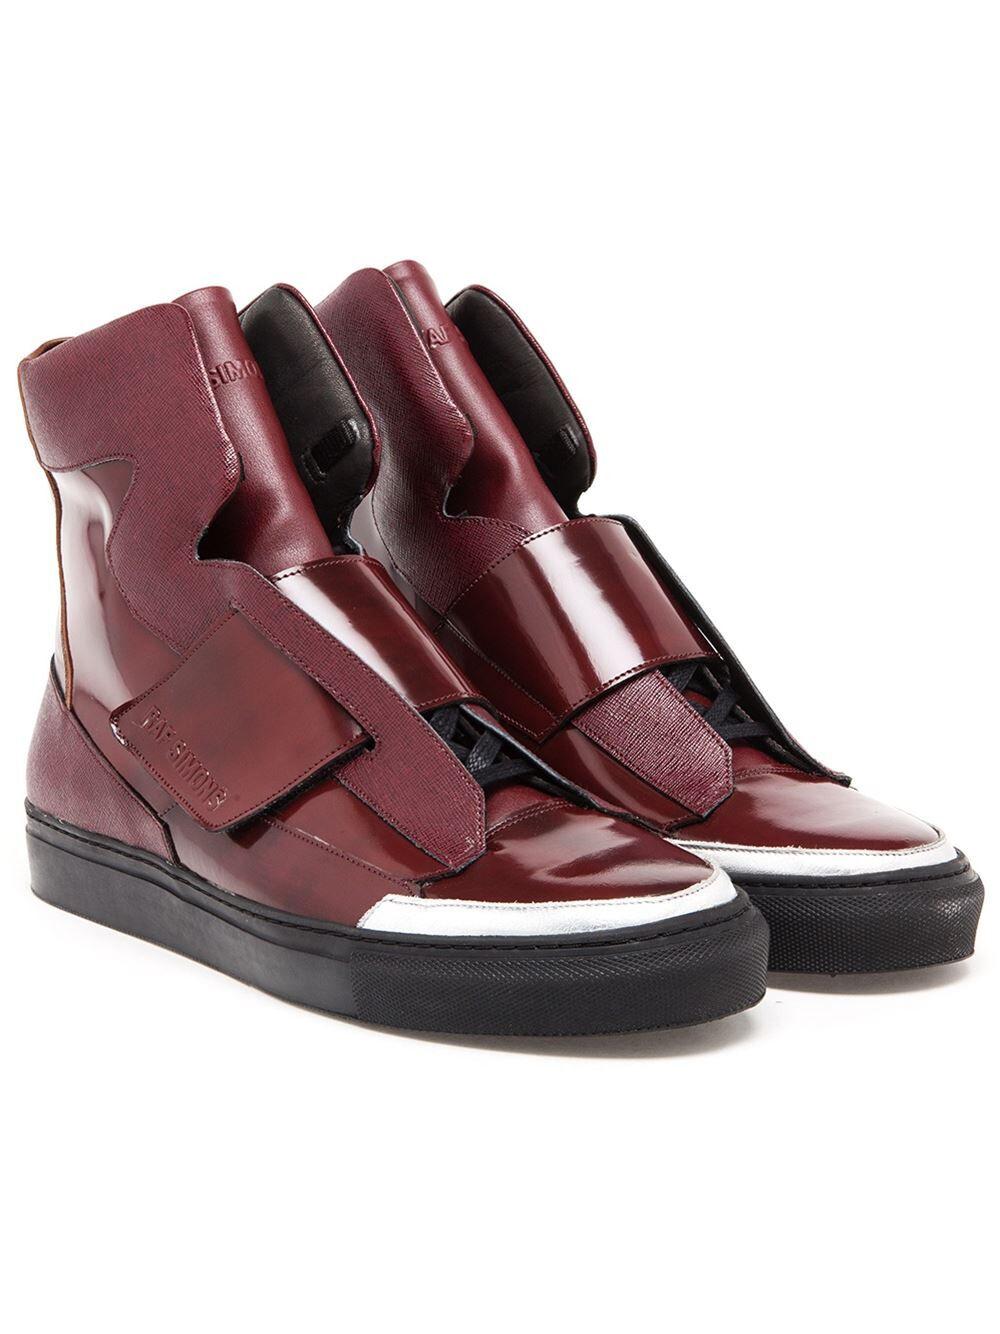 Raf Simons - Burgundy Leather High Top Trainers - Brand New